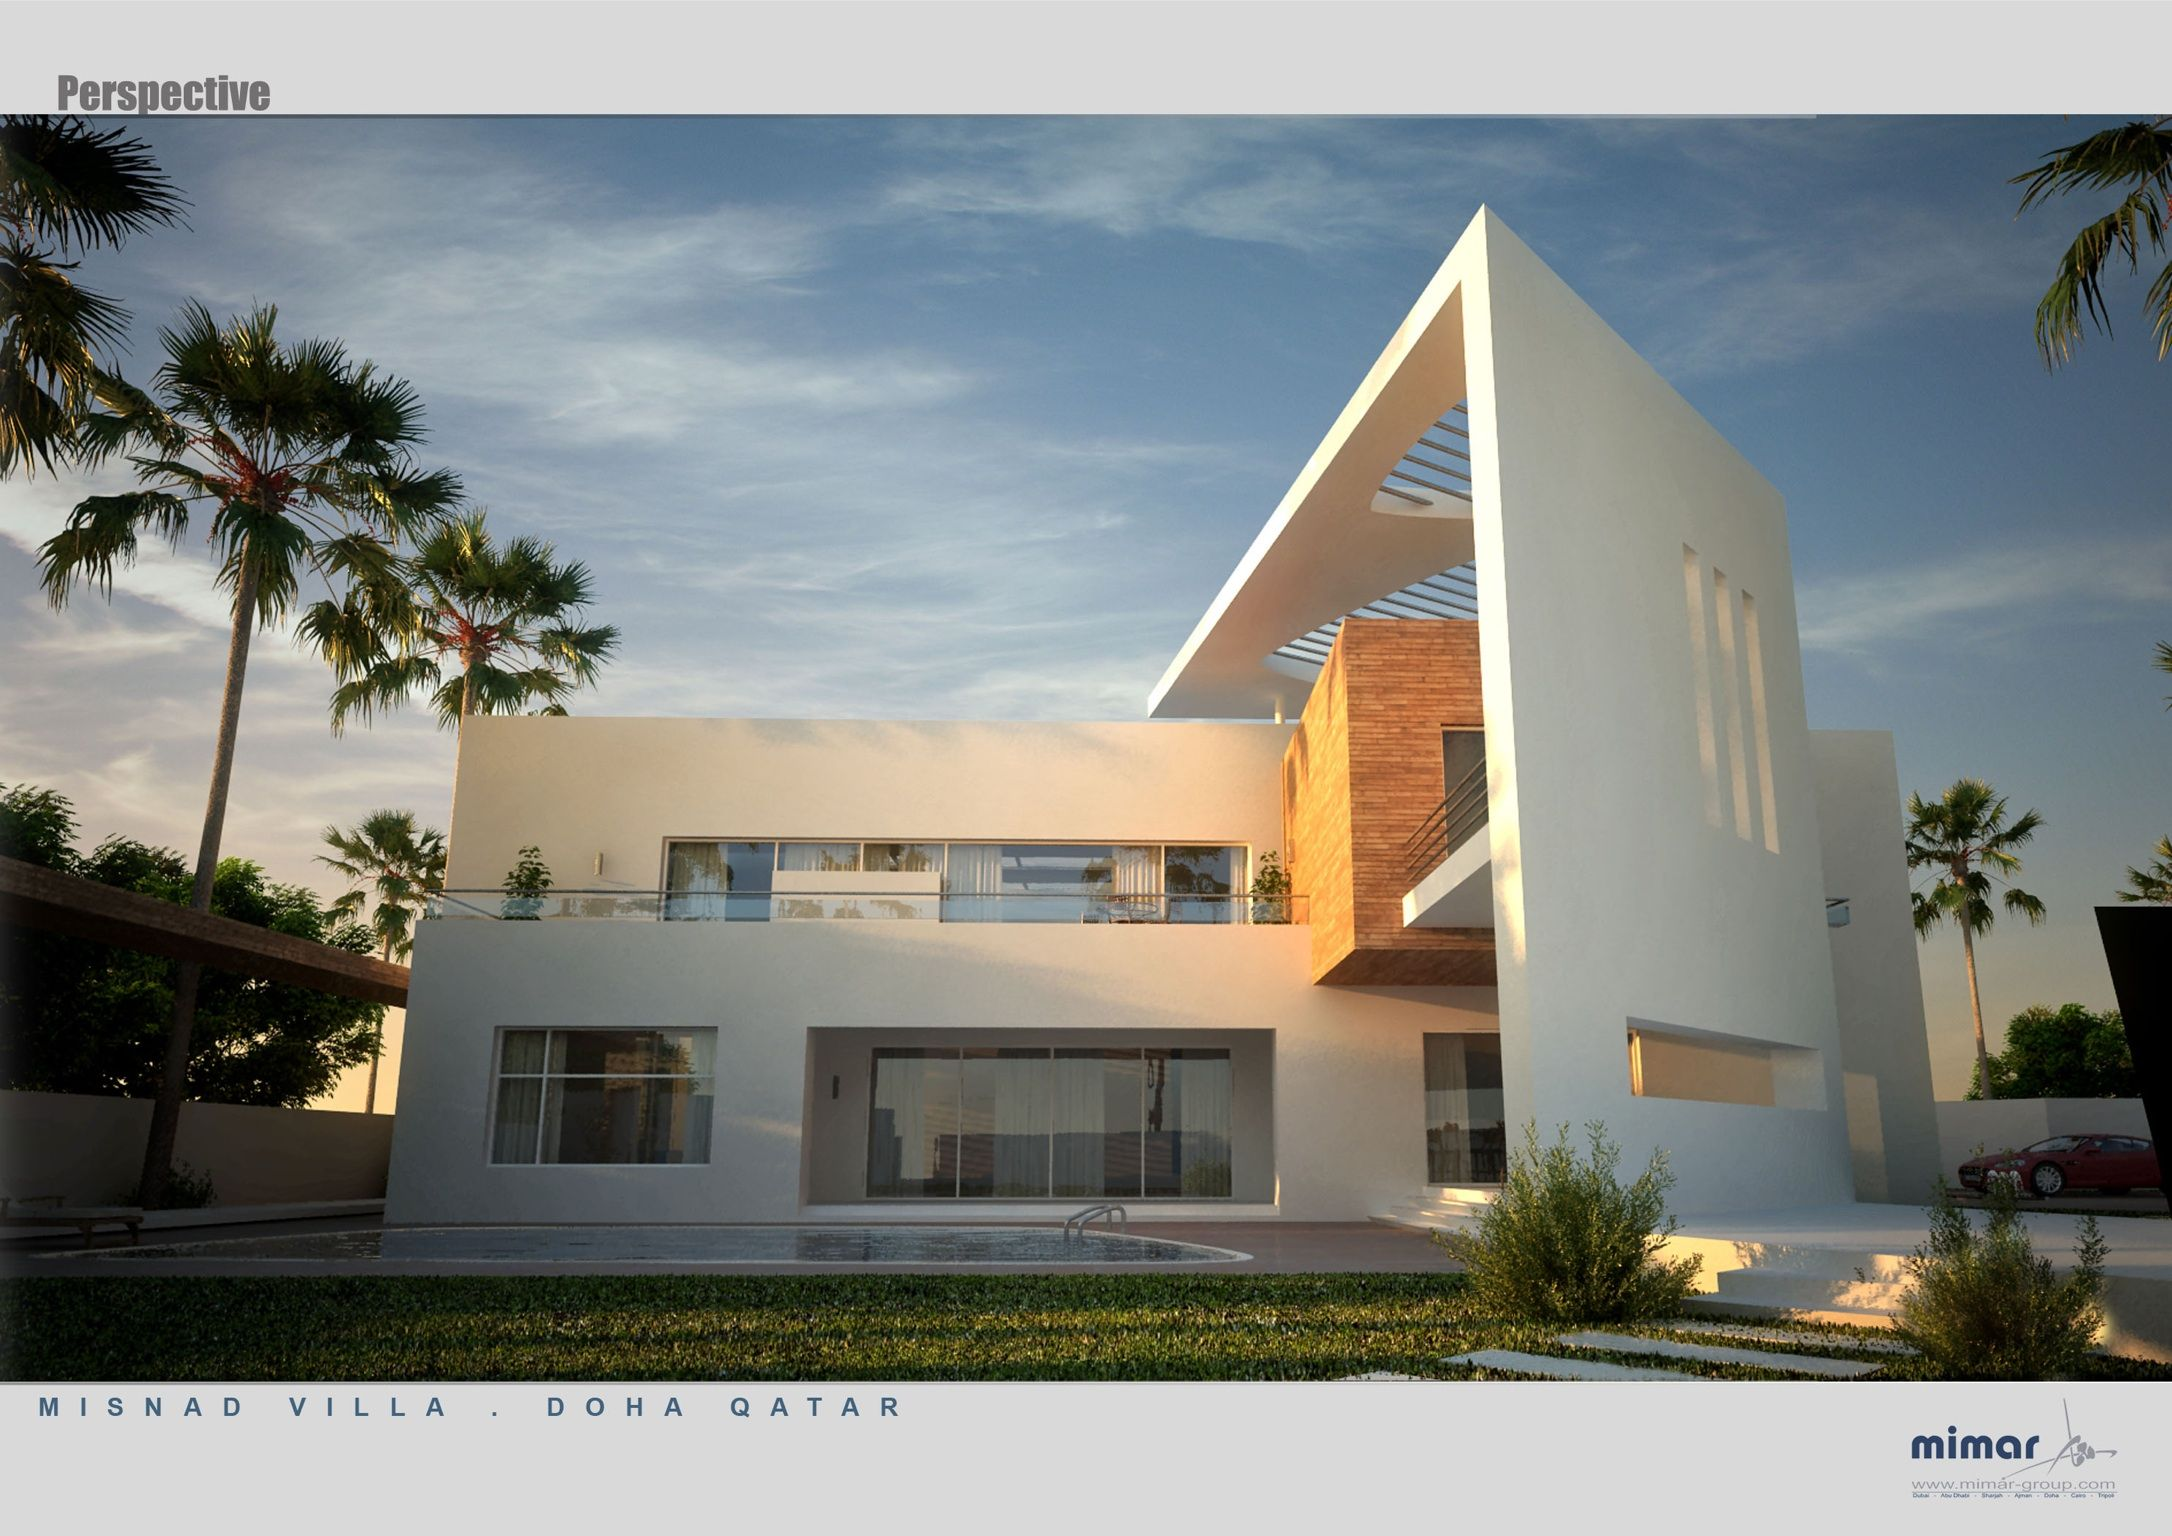 Modern Architecture, Villas, Buildings, Minimalist Design, Modern Houses, Minimalist Chic,